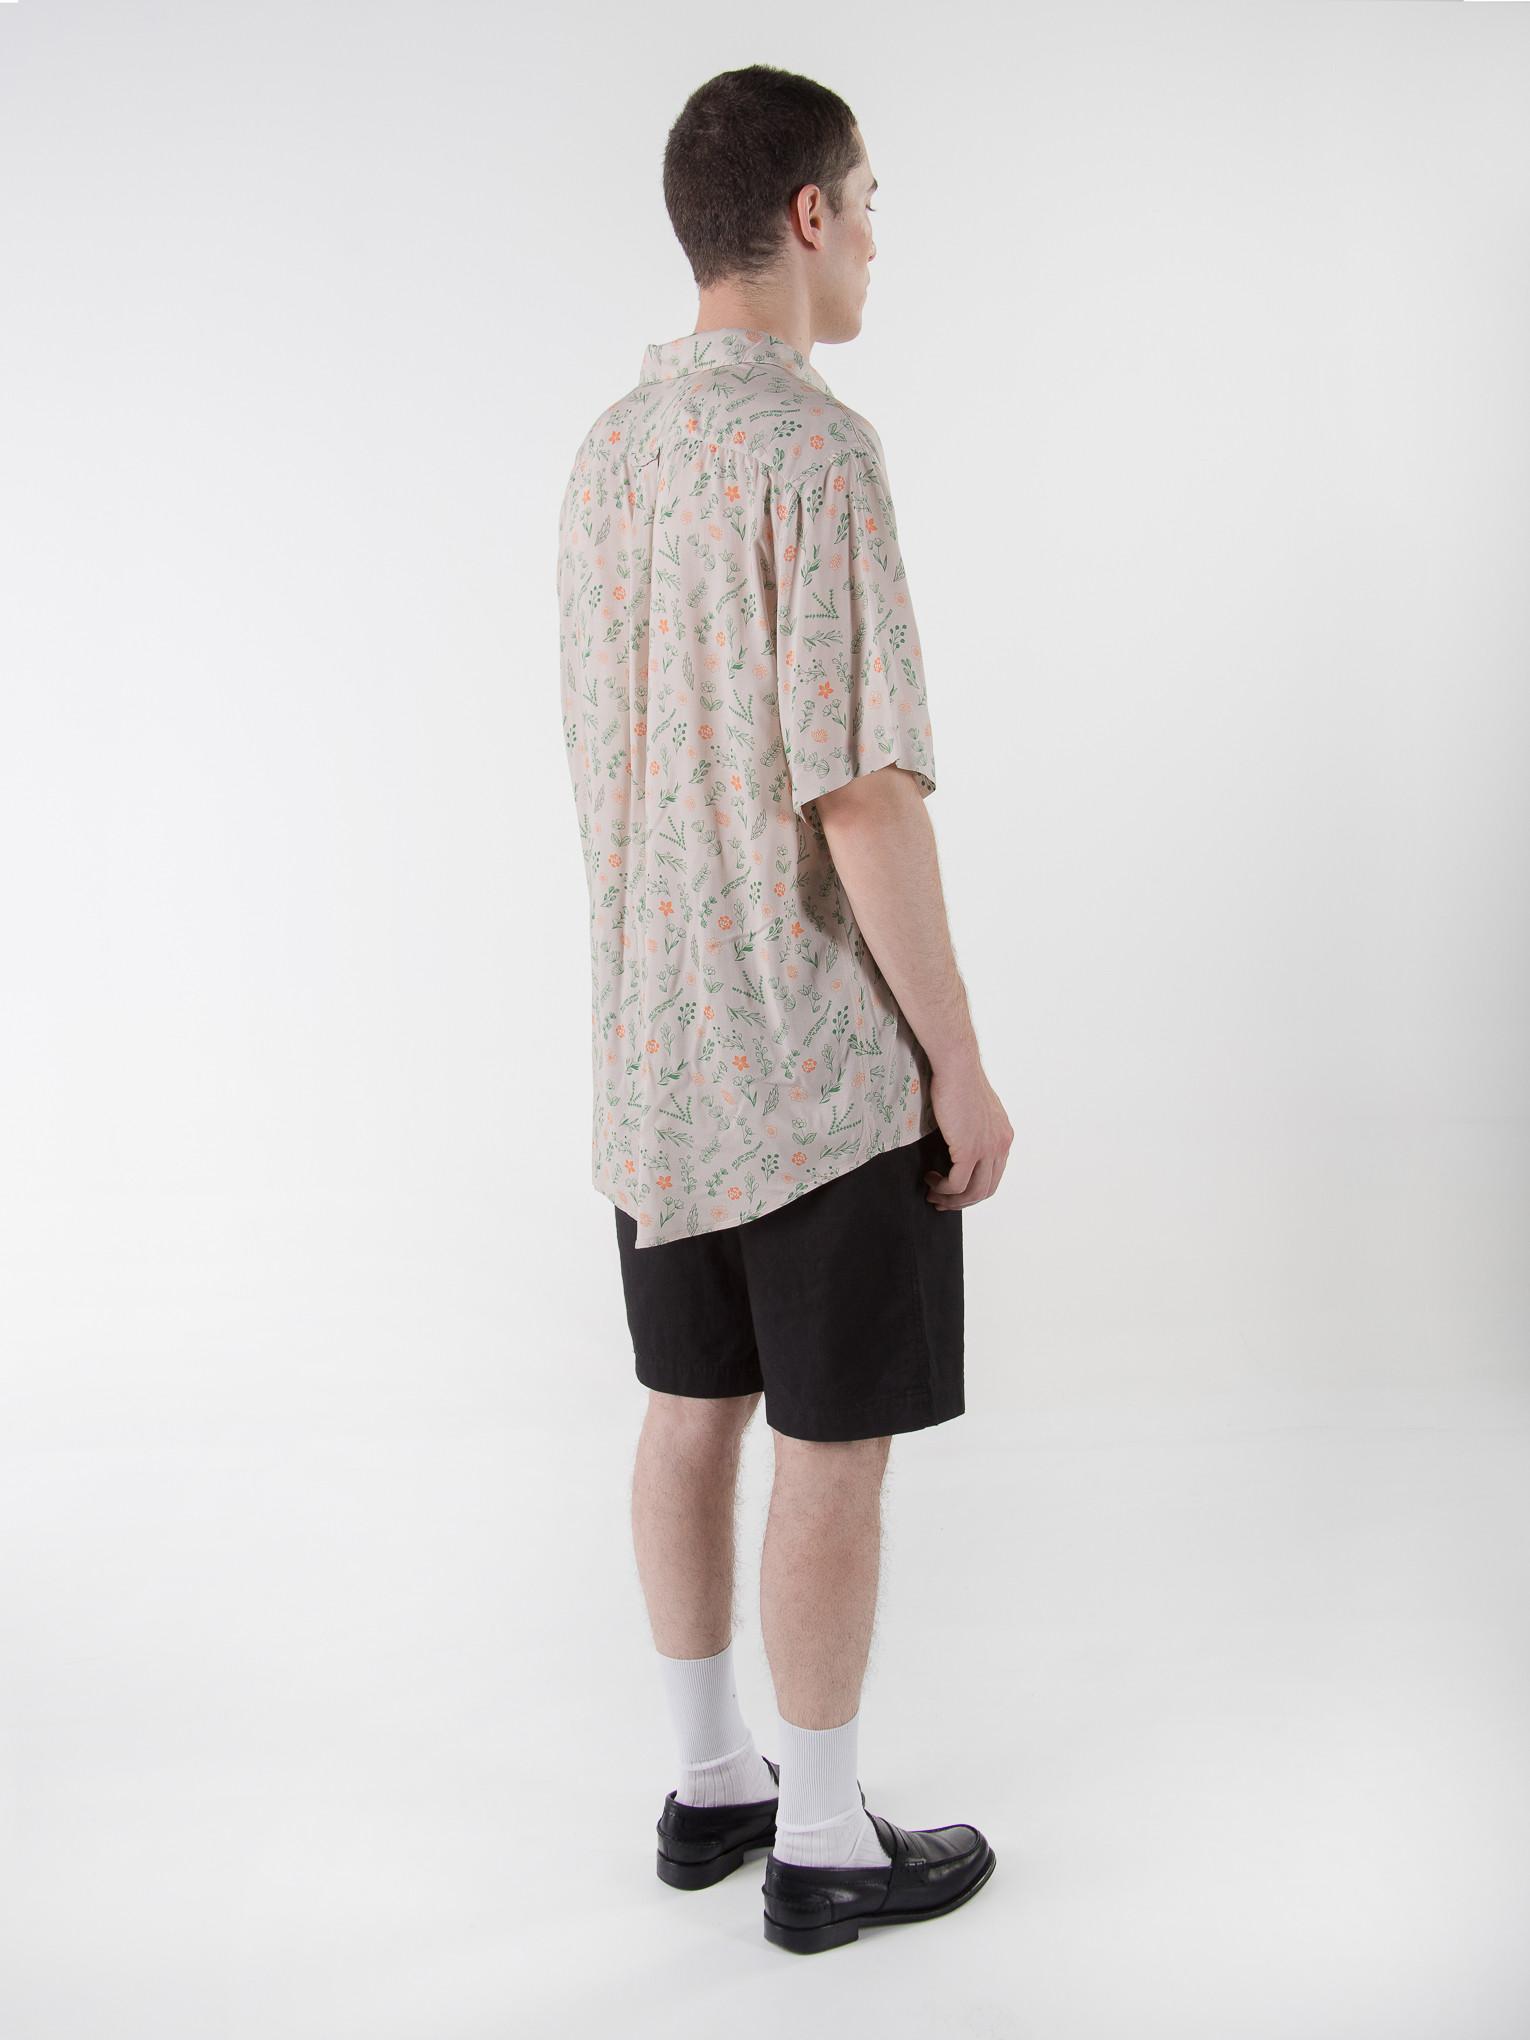 09_rold_skov_ss20_plantasia_shirt-01.jpg